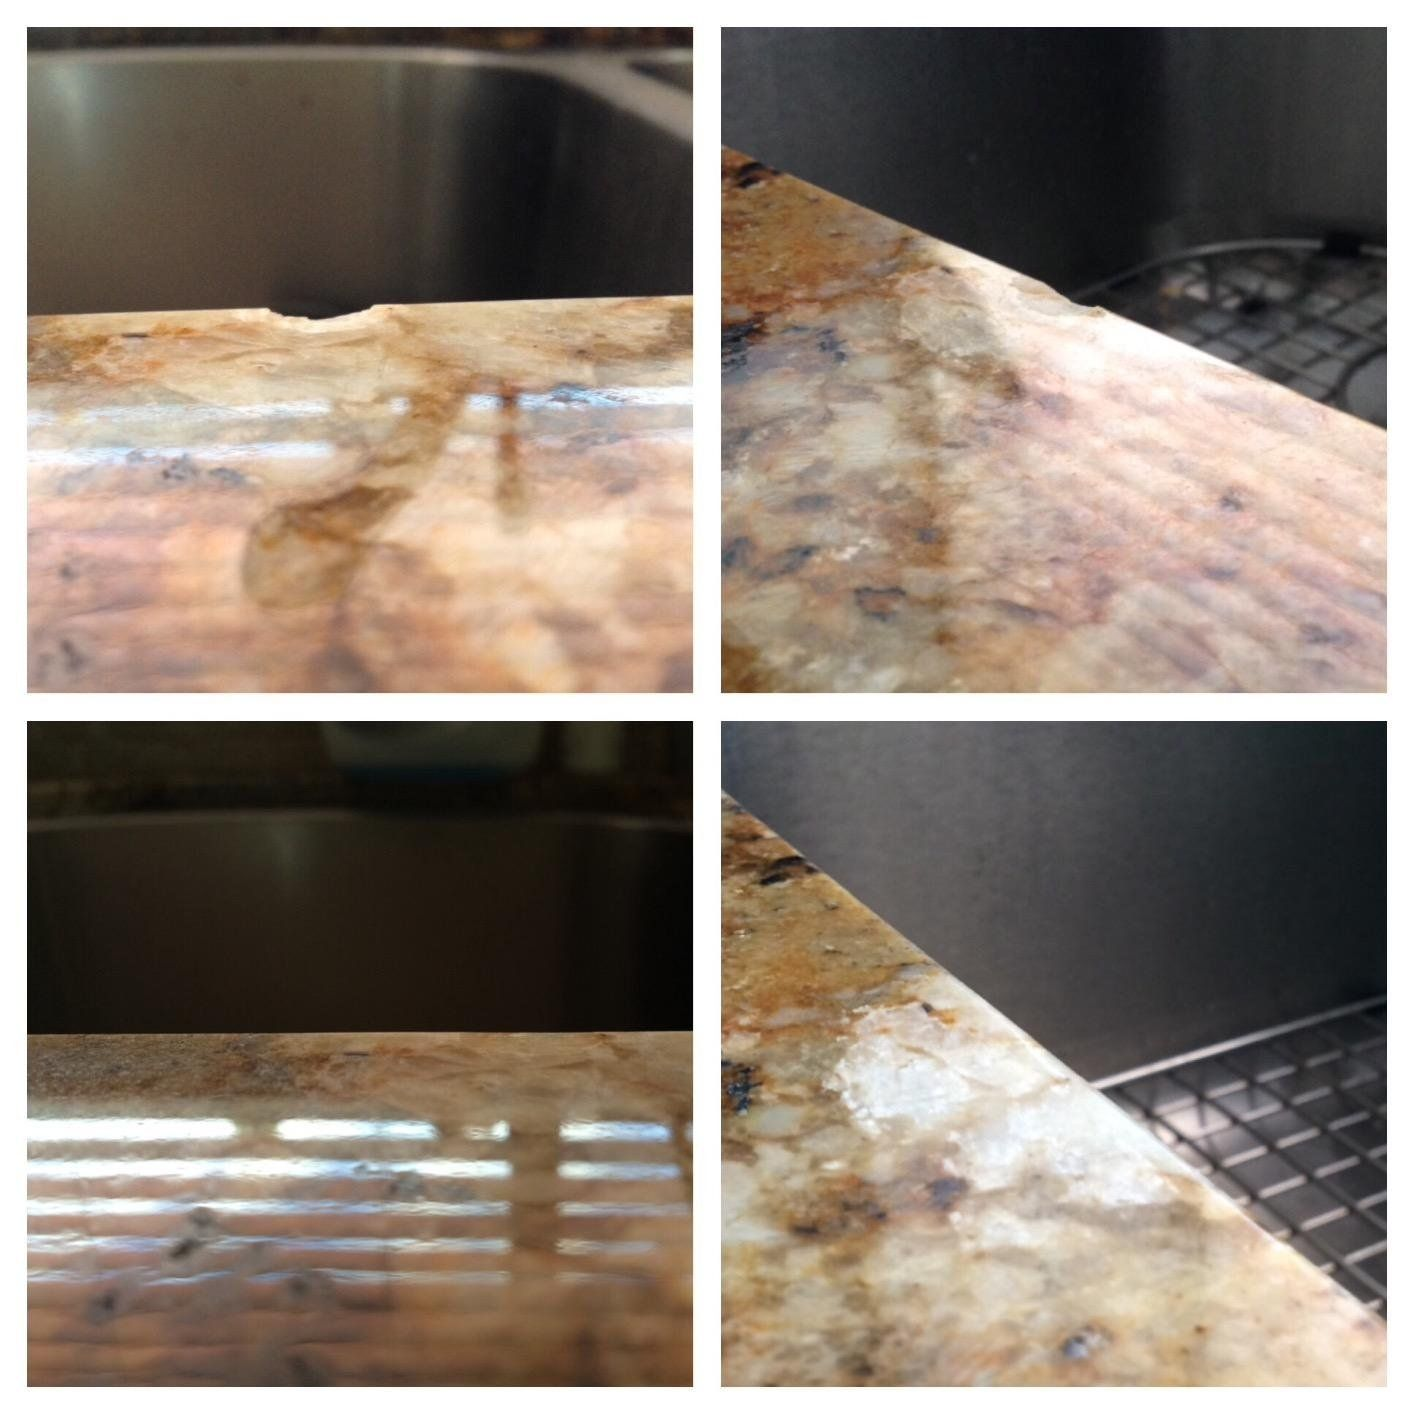 Customer Reviews Procaliber Products 10 11 711 Clear Lca Granite Marble Quartz Chip Repair Kit 1 Ml Syringe